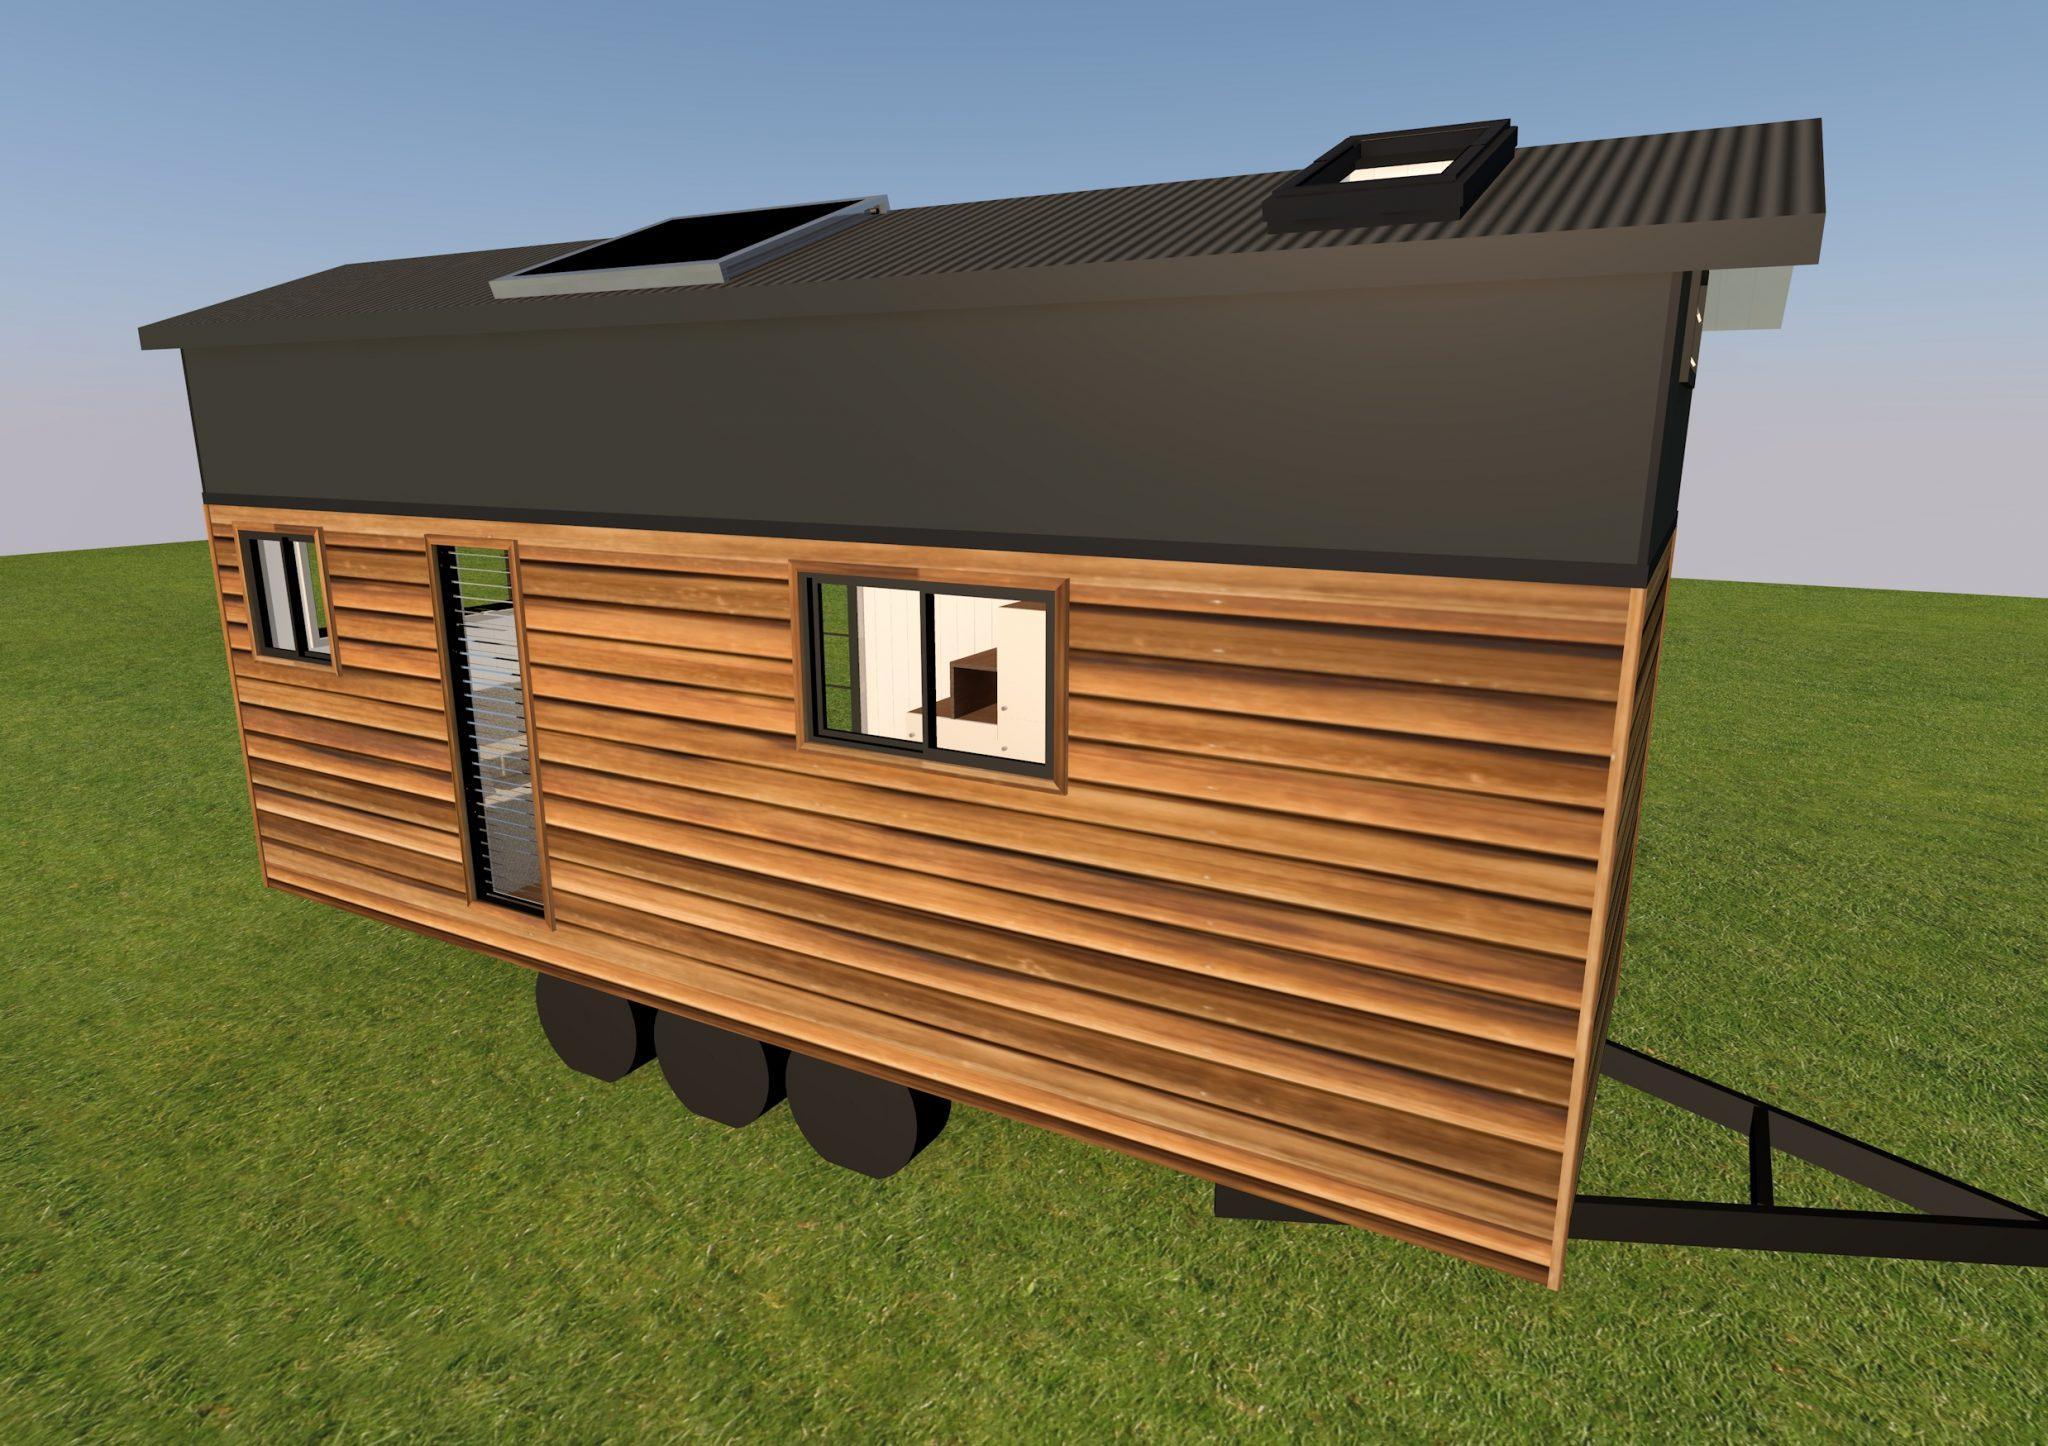 Lifestyle Series 7200DL Base Model exterior view